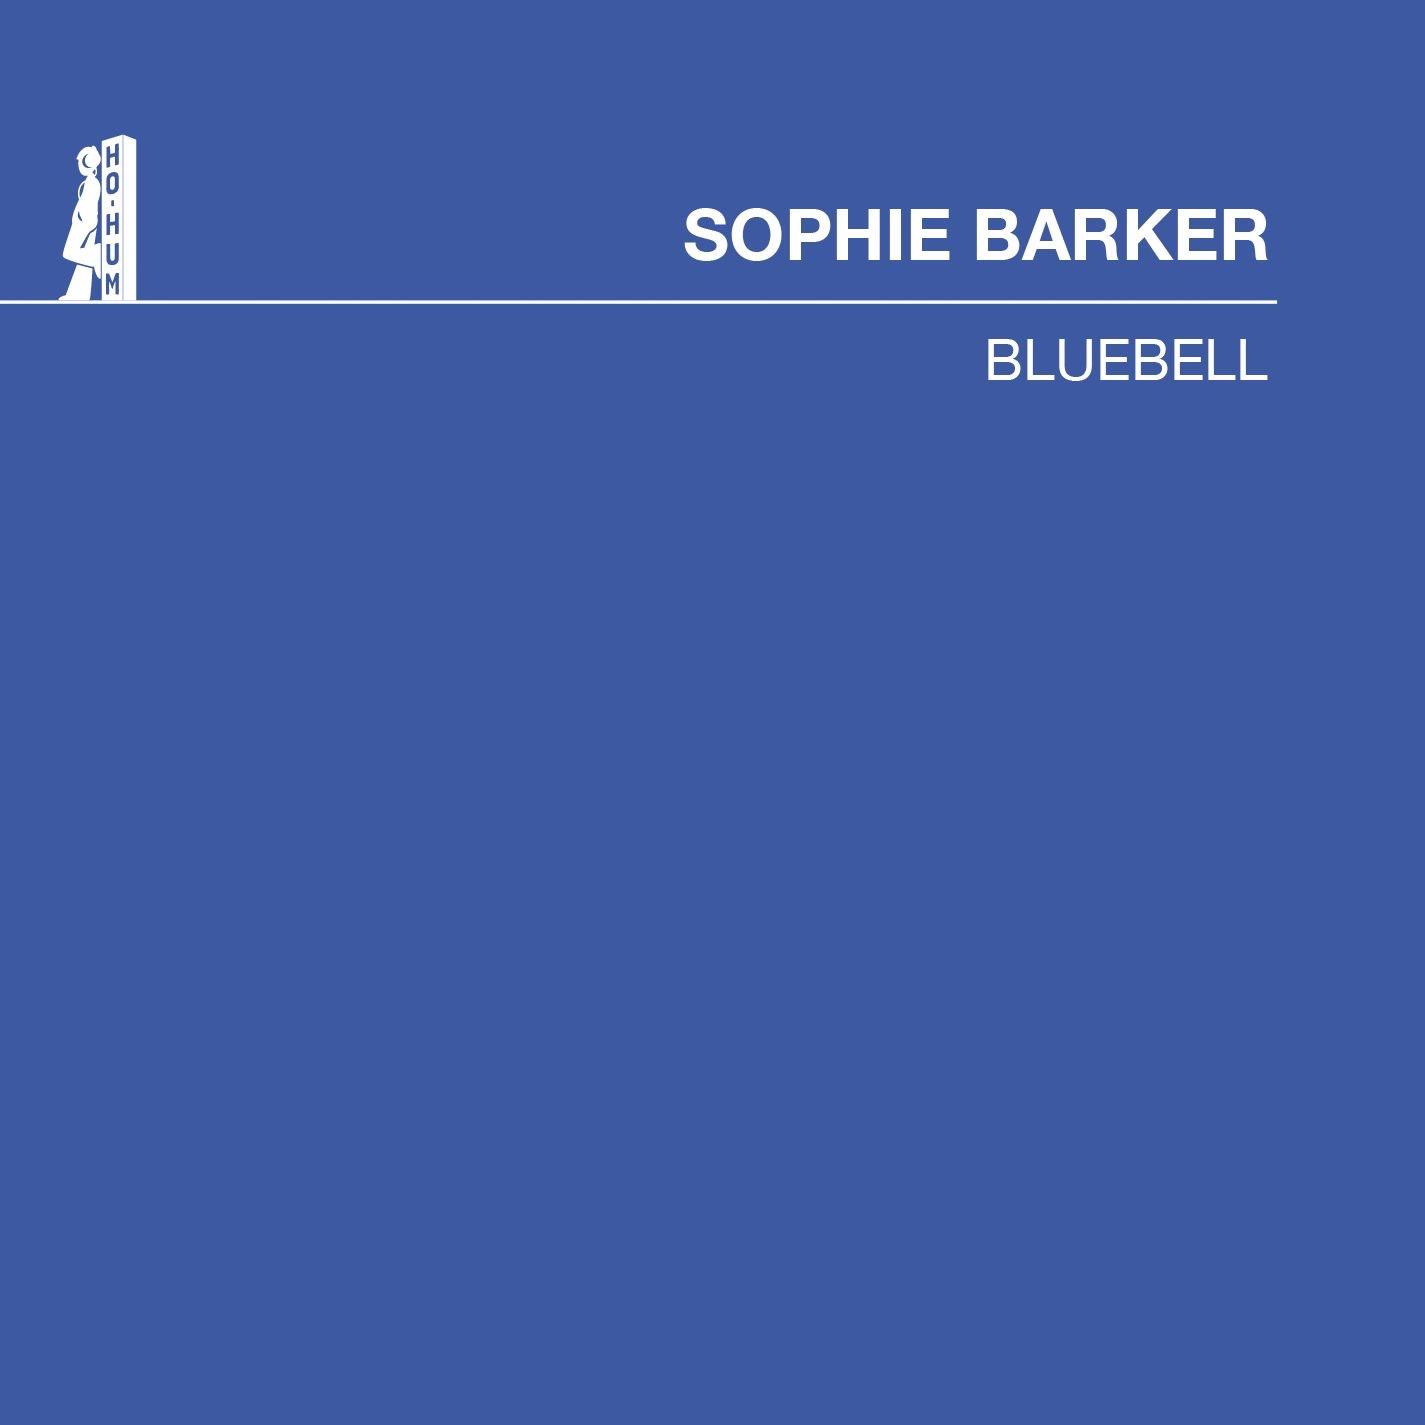 Bluebell - Single